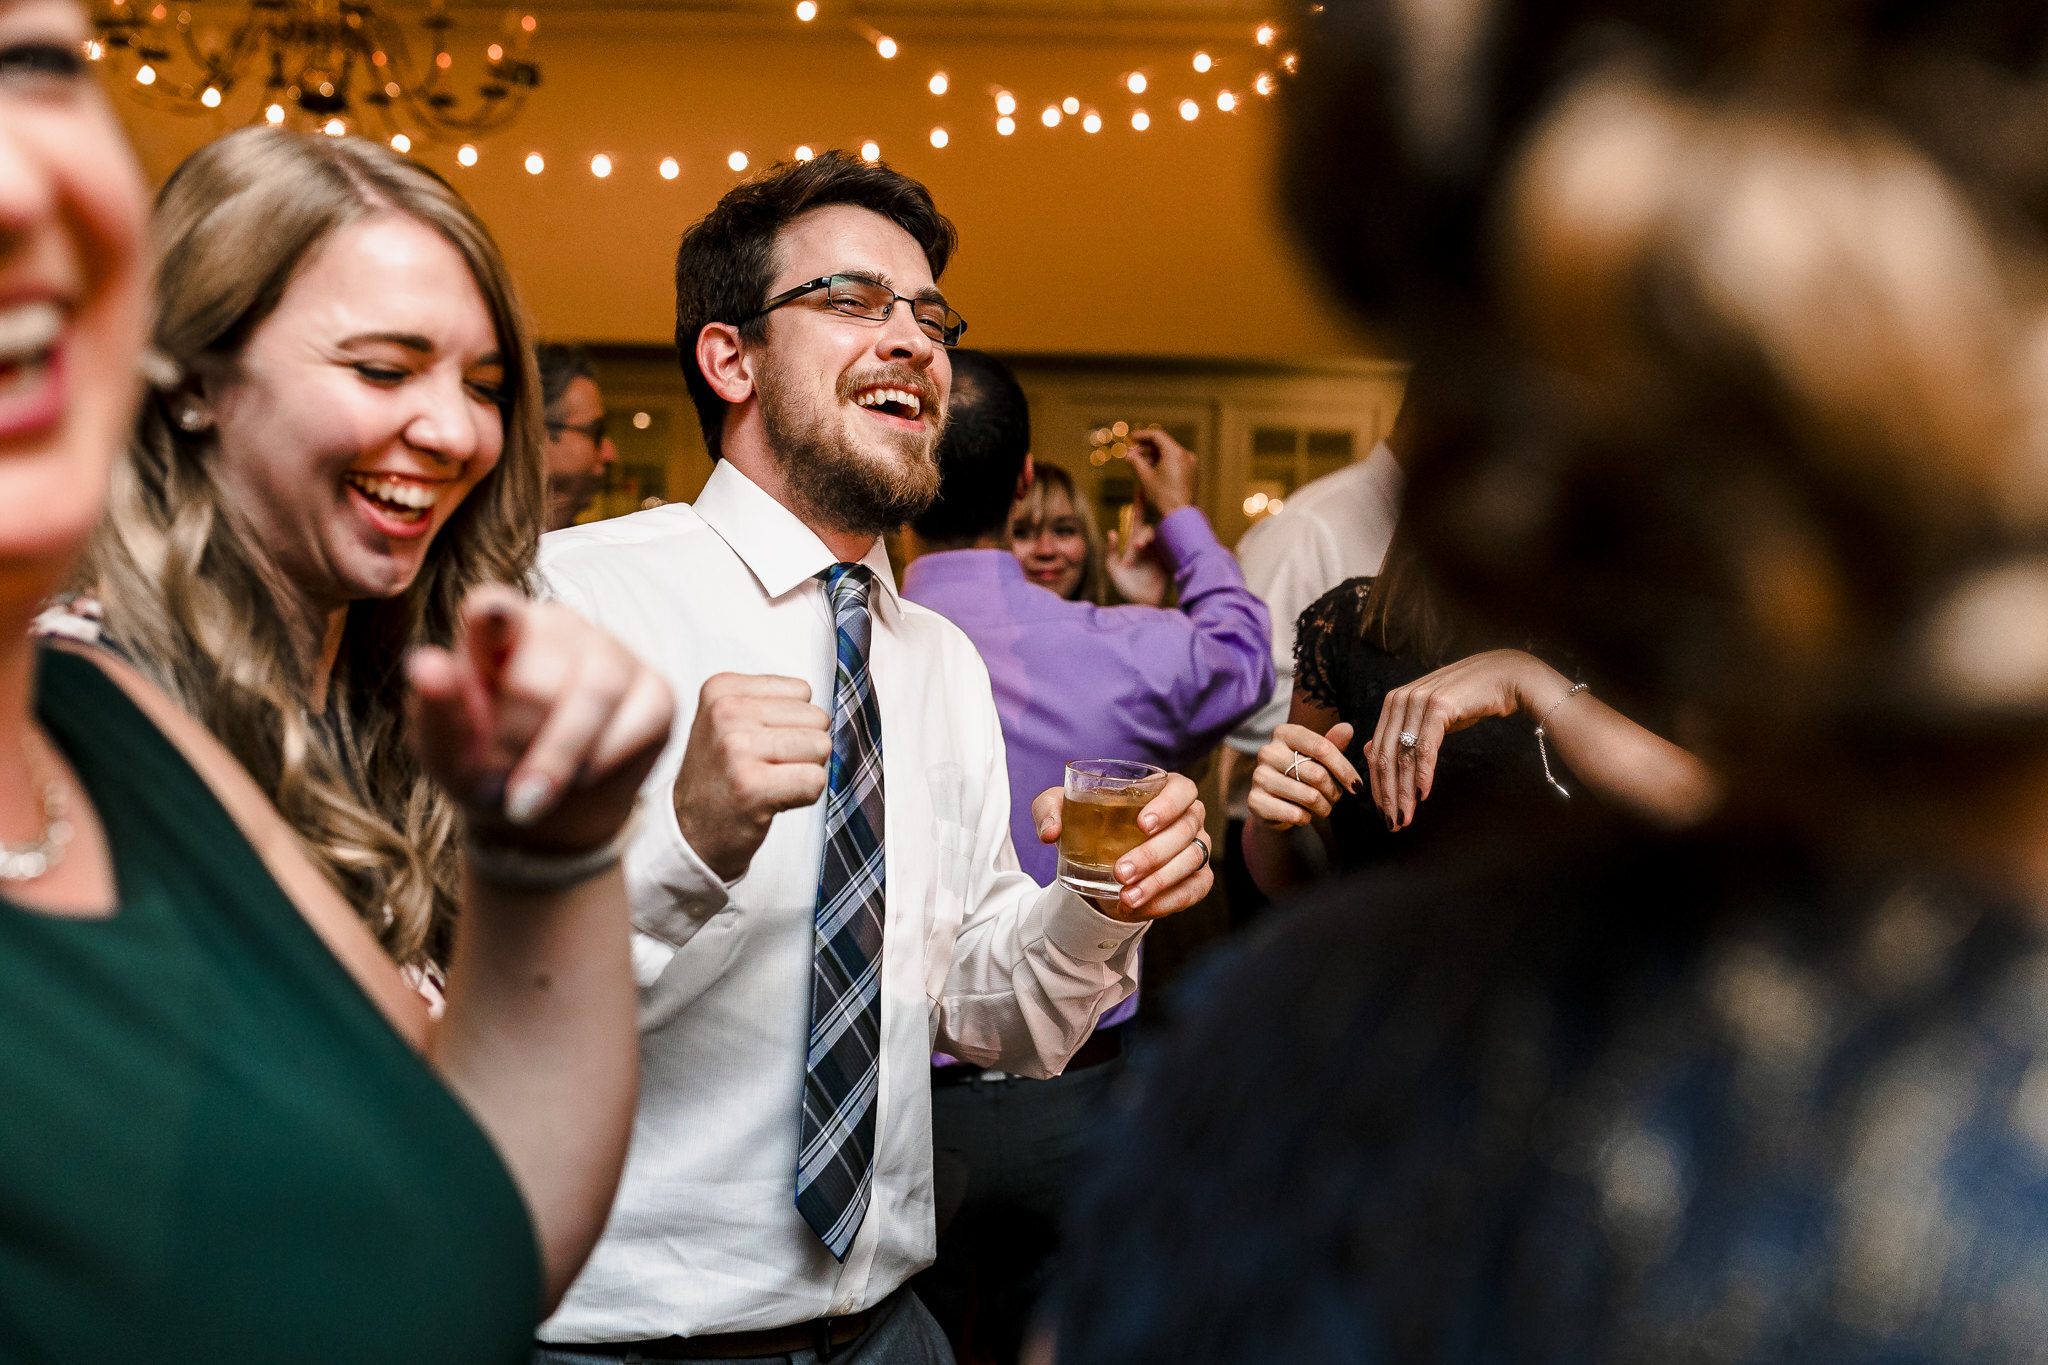 Coyle-Forsgate-Country-Club-Wedding-Photographer-46.JPG